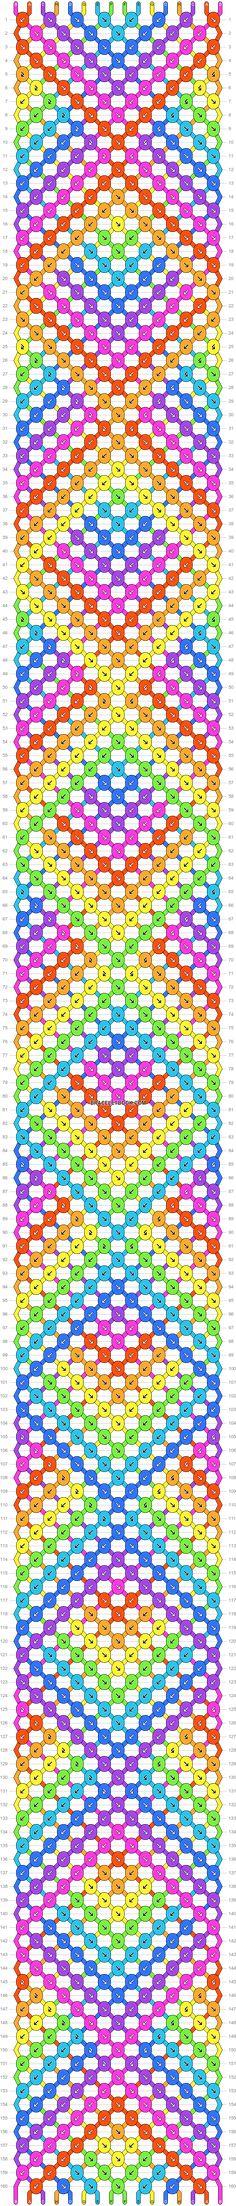 Normal pattern #37615 | BraceletBook